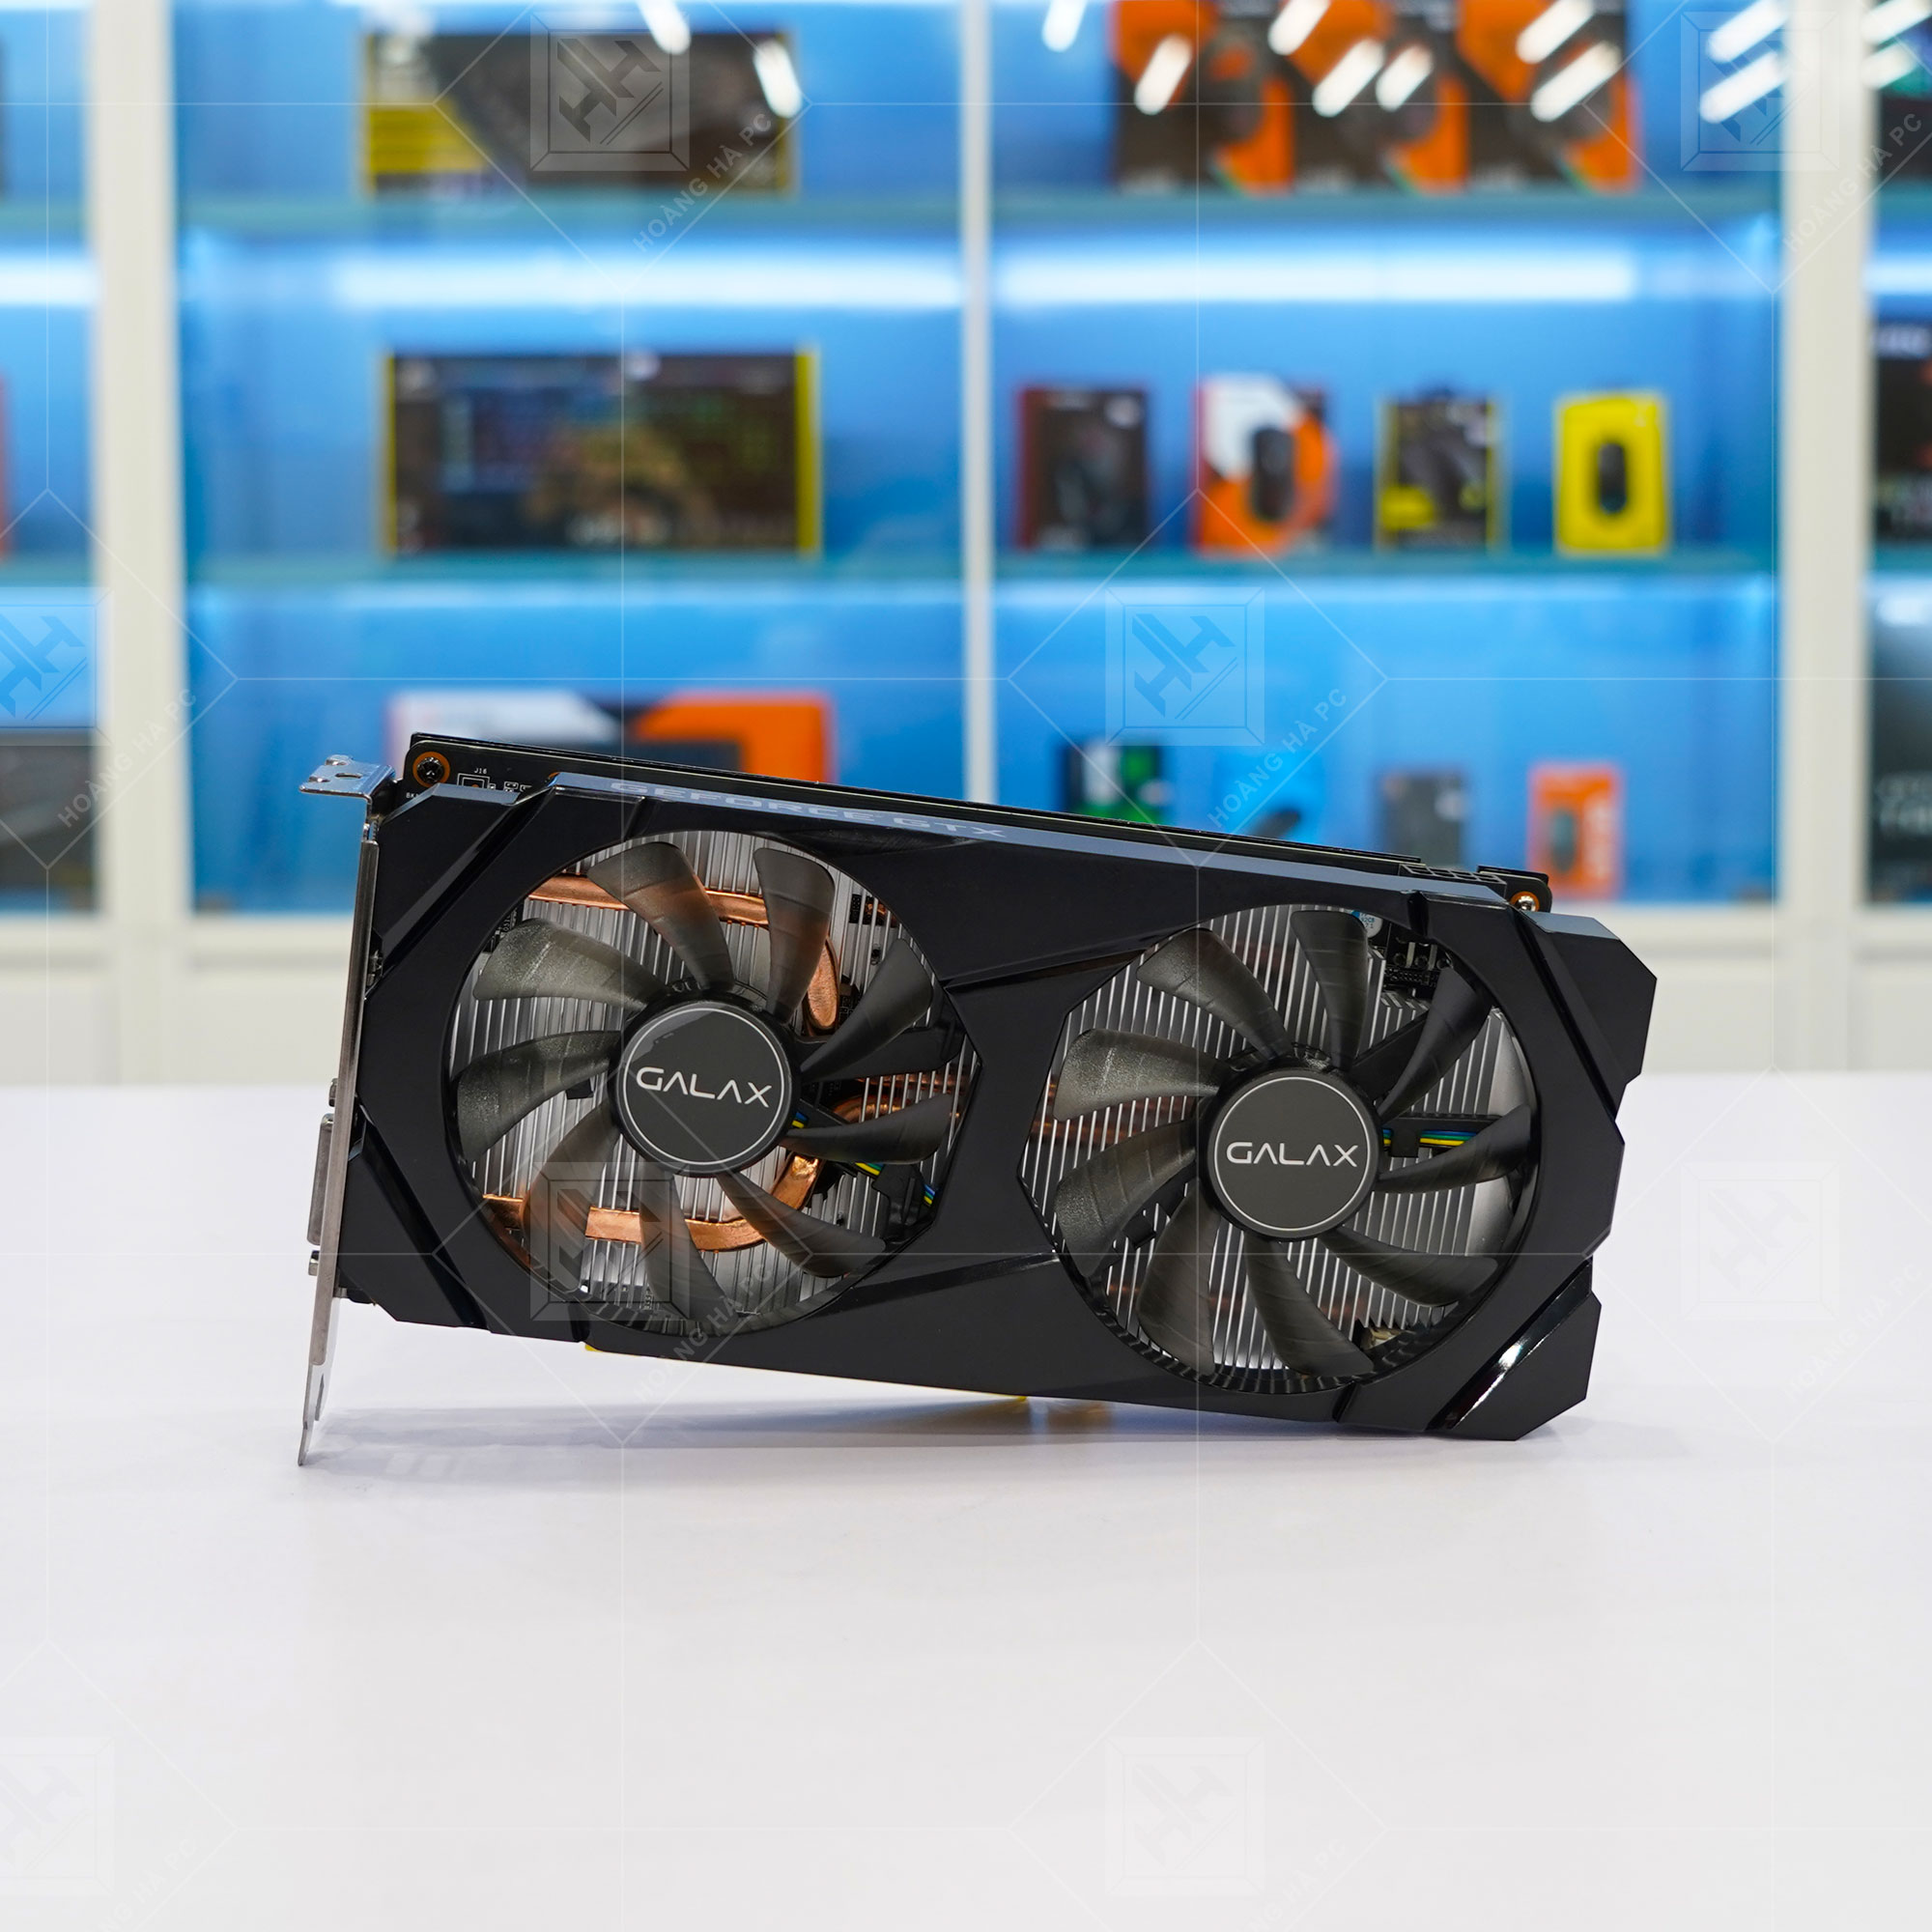 VGA Galax GTX 1660Ti 1 Click OC 6G Black